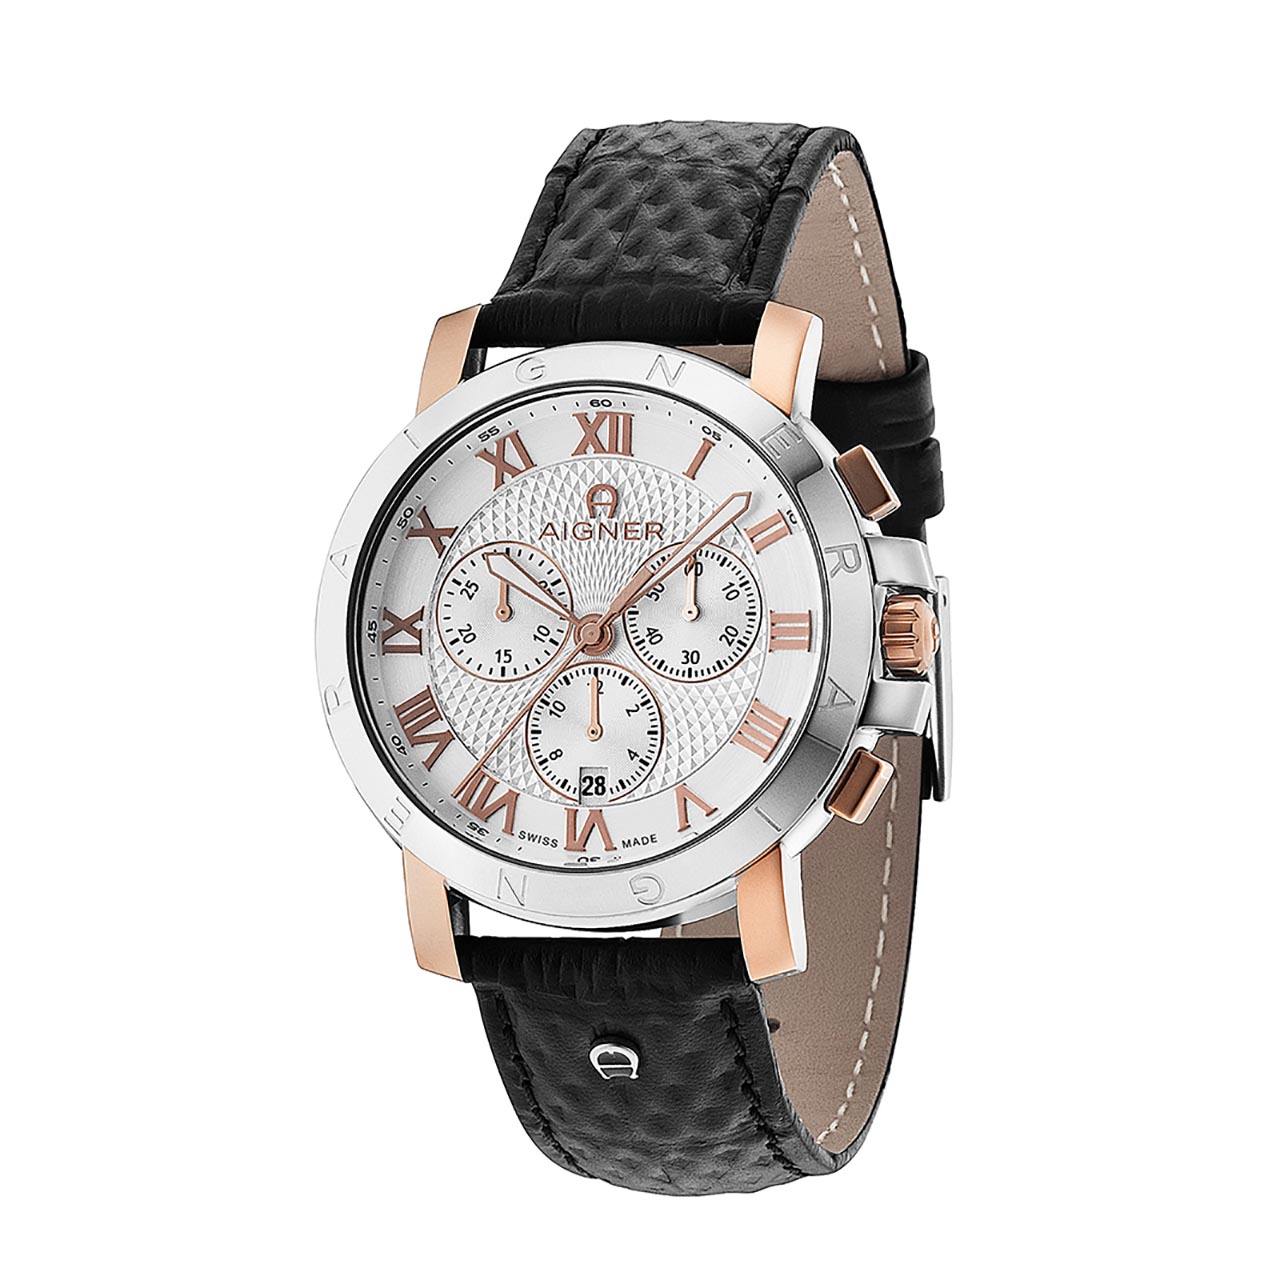 ساعت مچی عقربه ای مردانه اگنر مدل A09504